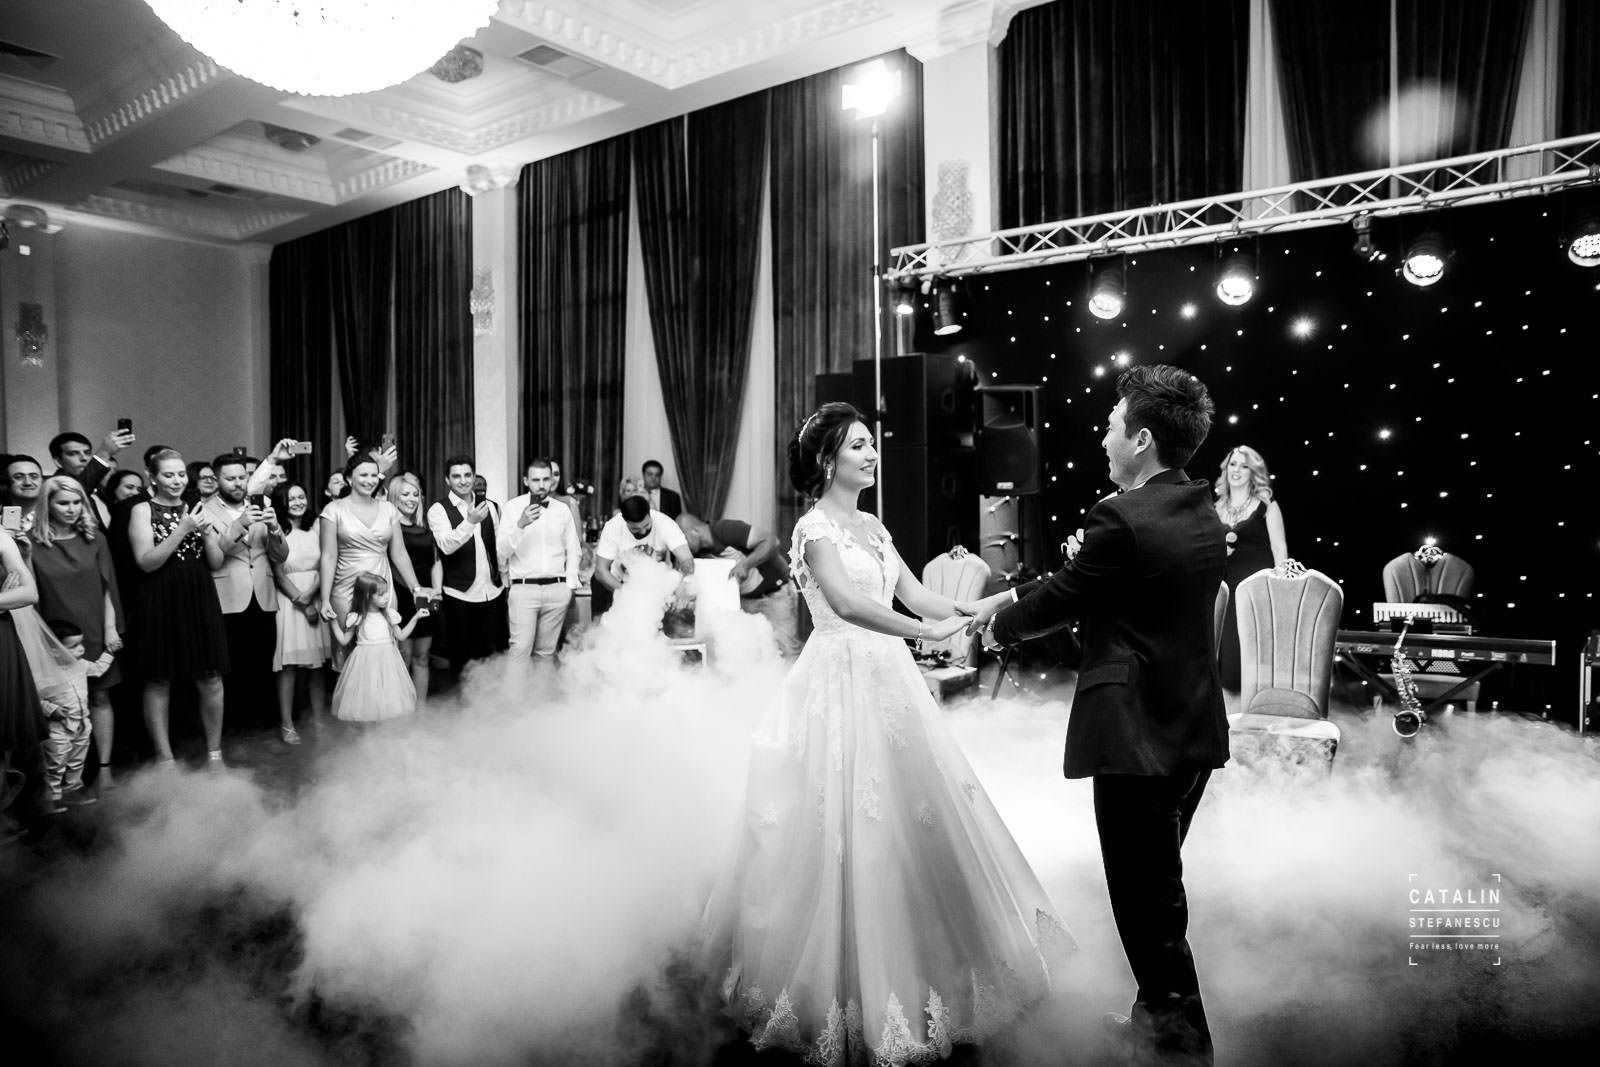 Fotograf Profesionist De Nunta - Fotograf Nunta Bucuresti - Catalin Stefanescu - Nunta Adelaide & Adrian